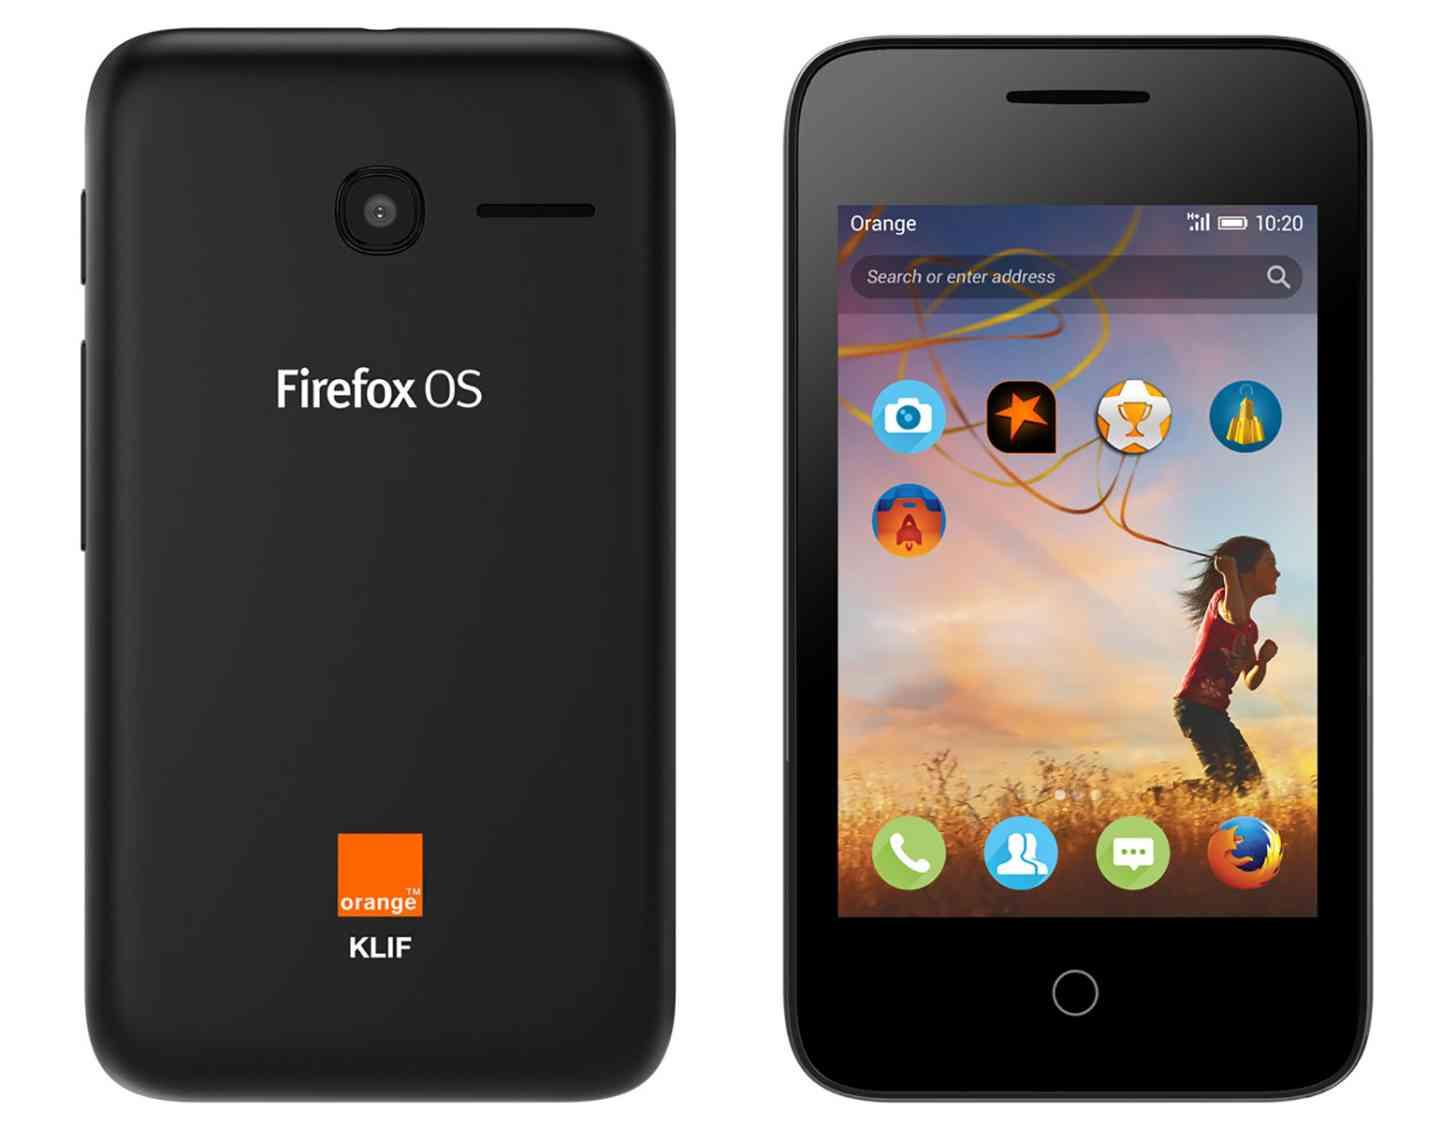 Orange Klif Firefox OS official